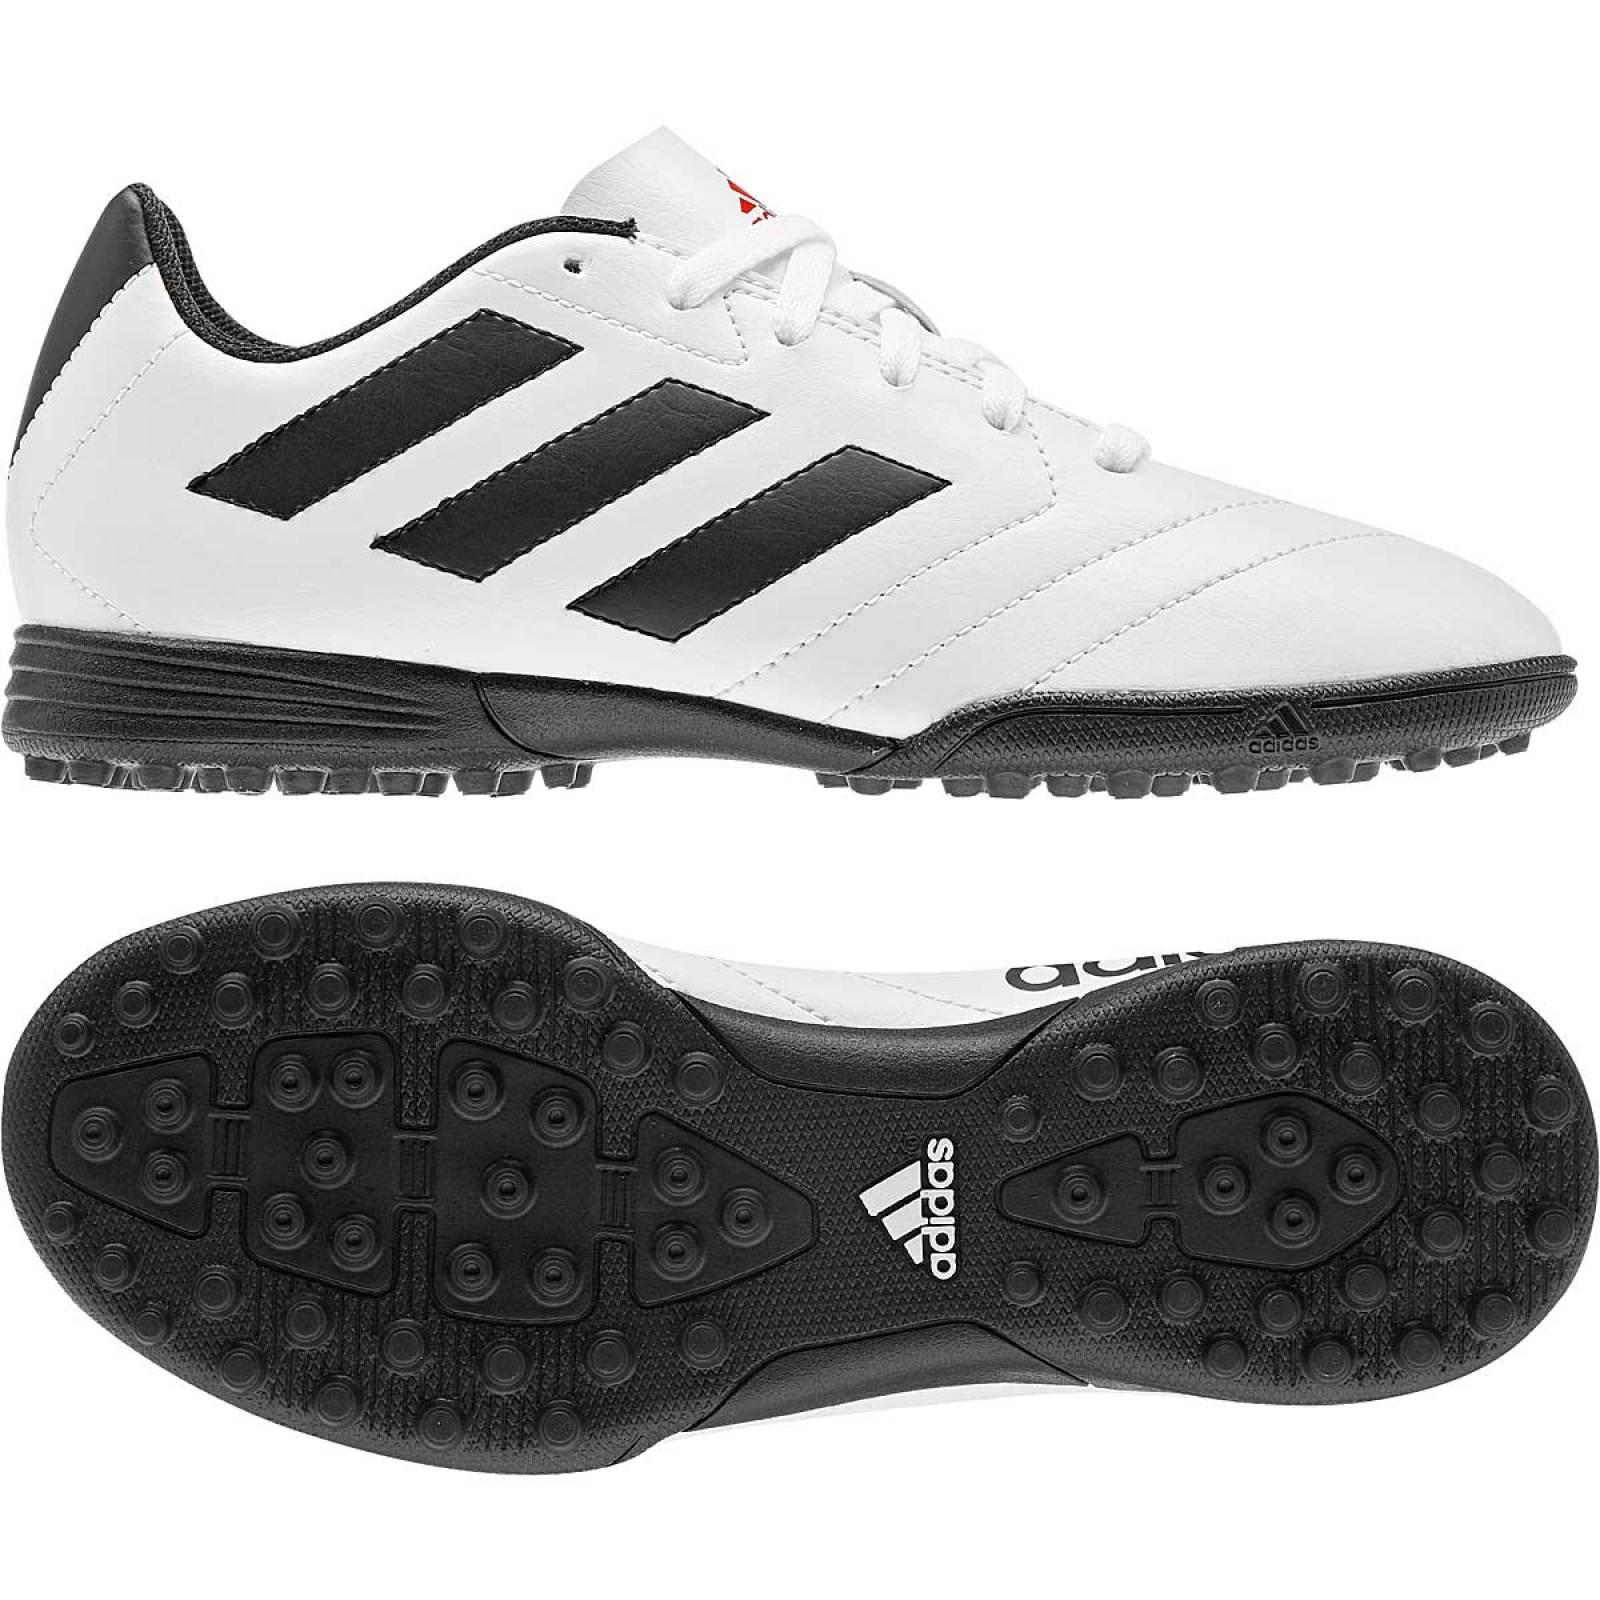 Adidas Tenis Joven Blanco negro